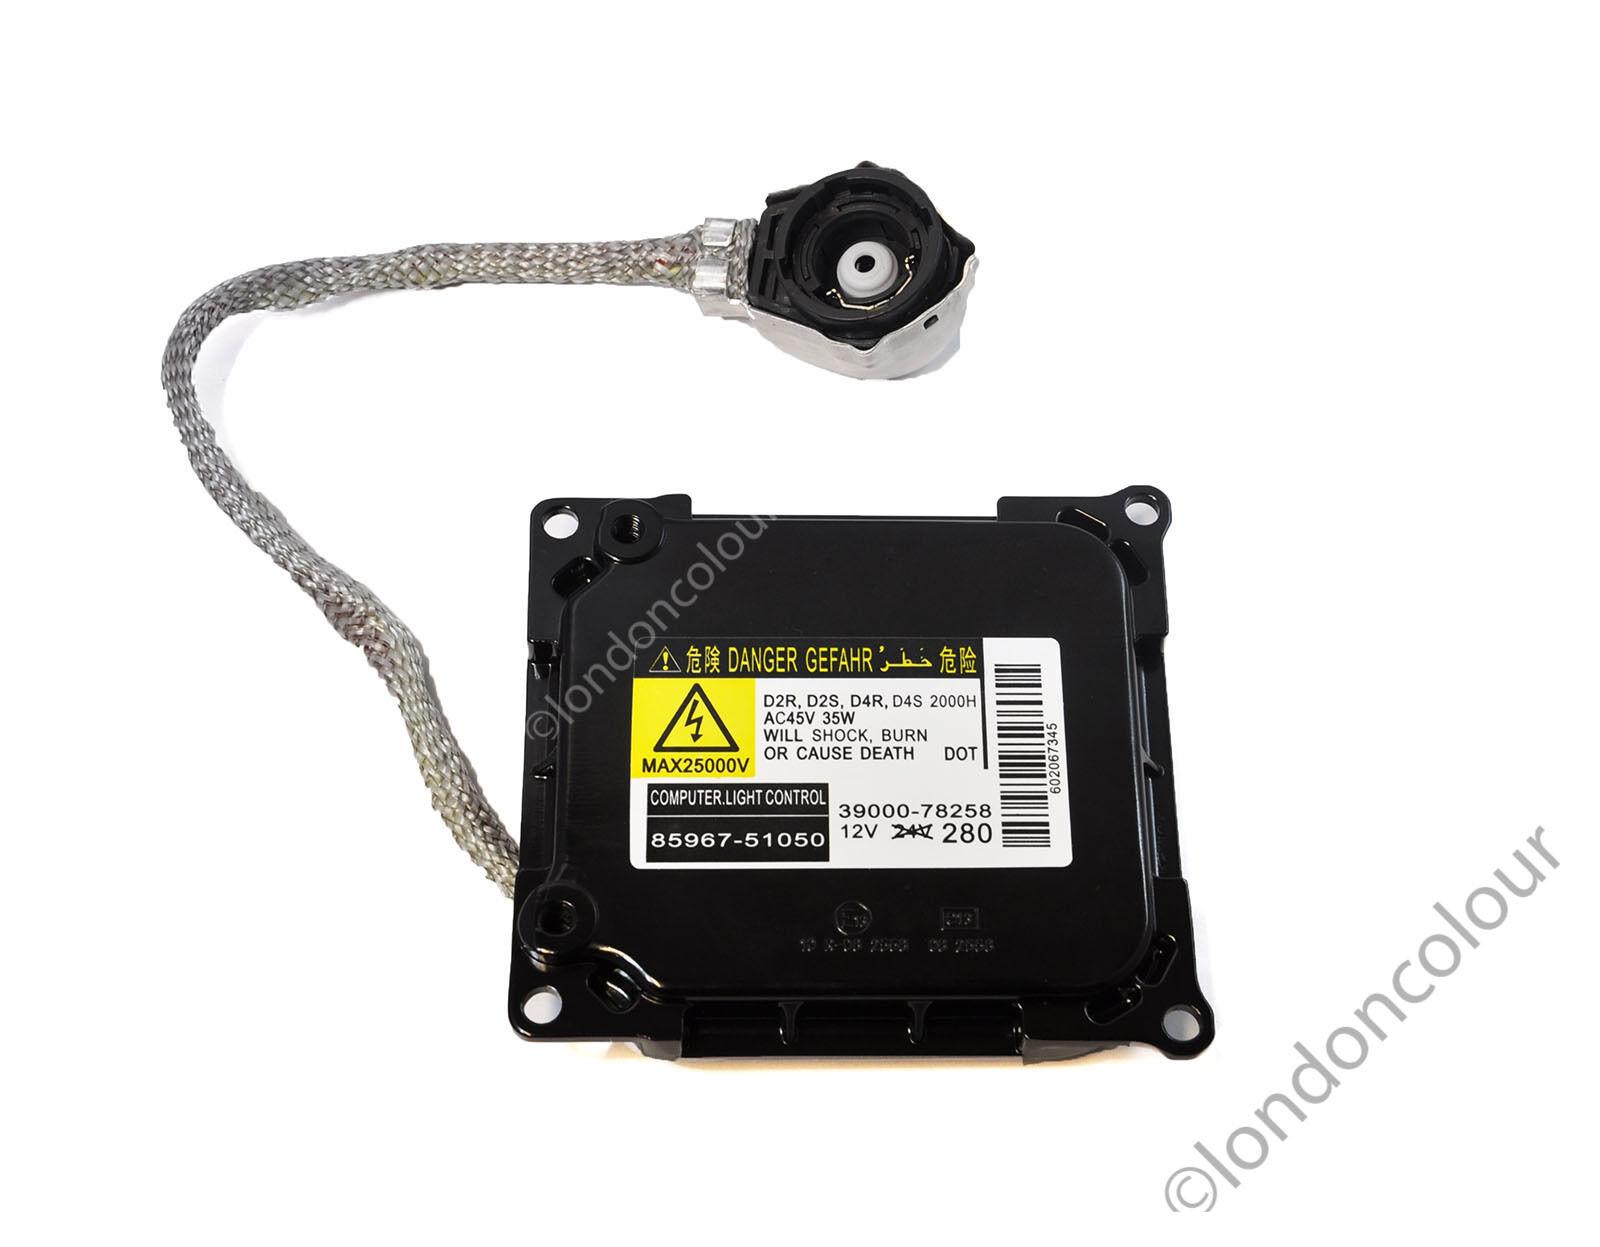 D4S Xenon HID Ballast Headlight Control Kit Replacement for Toyota Lexus DDLT003